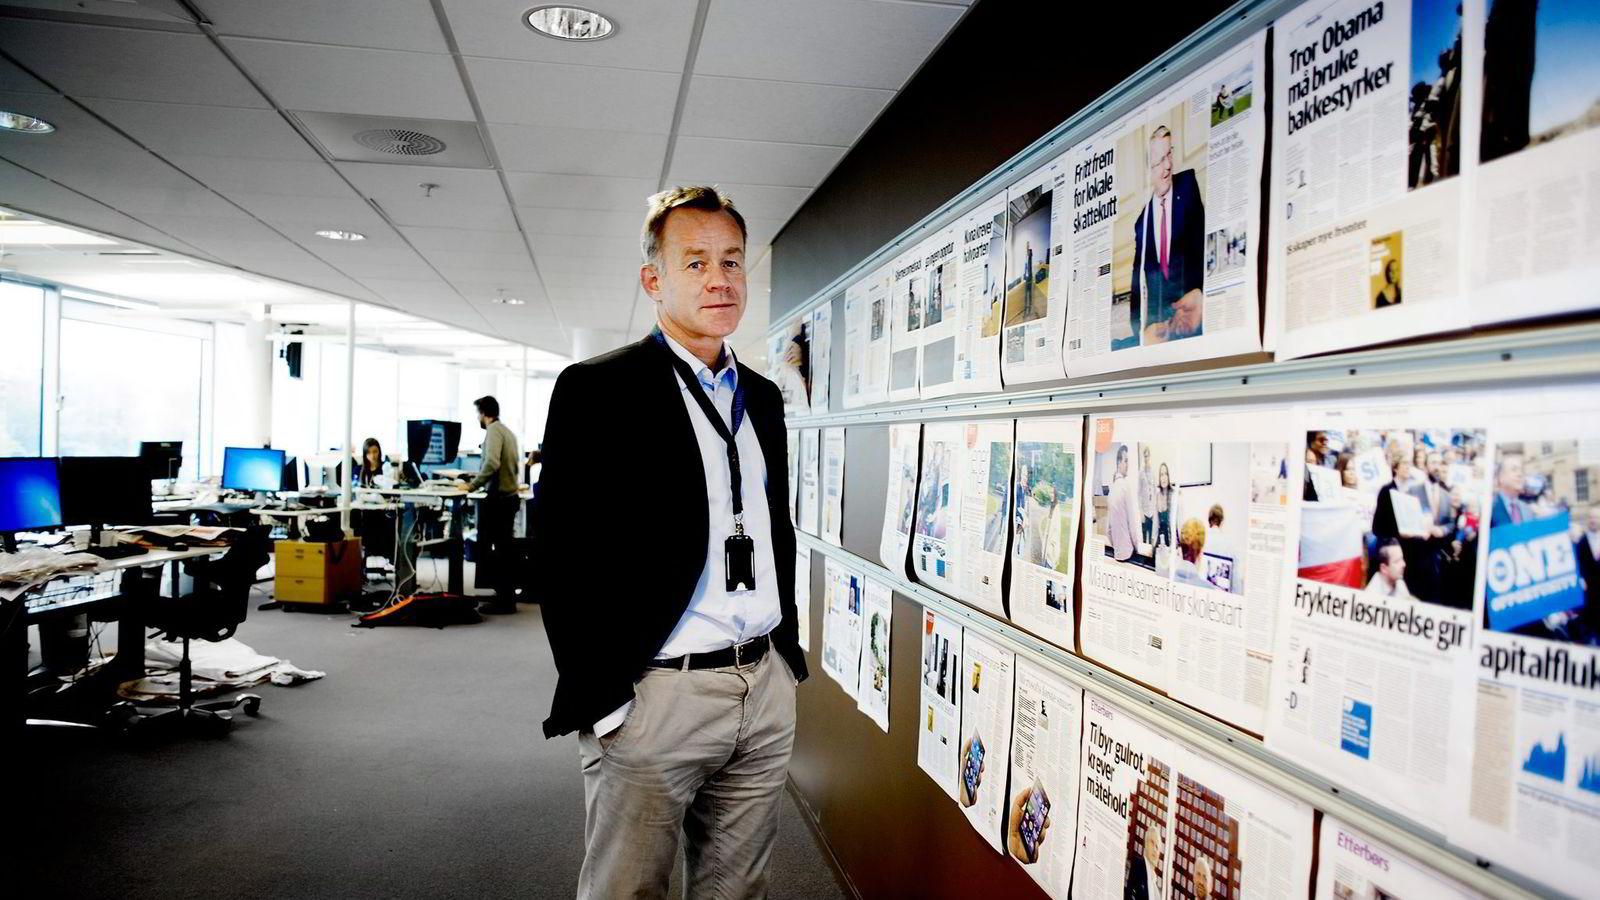 Sjefredaktør og administrerende direktør Amund Djuve i Dagens Næringsliv.